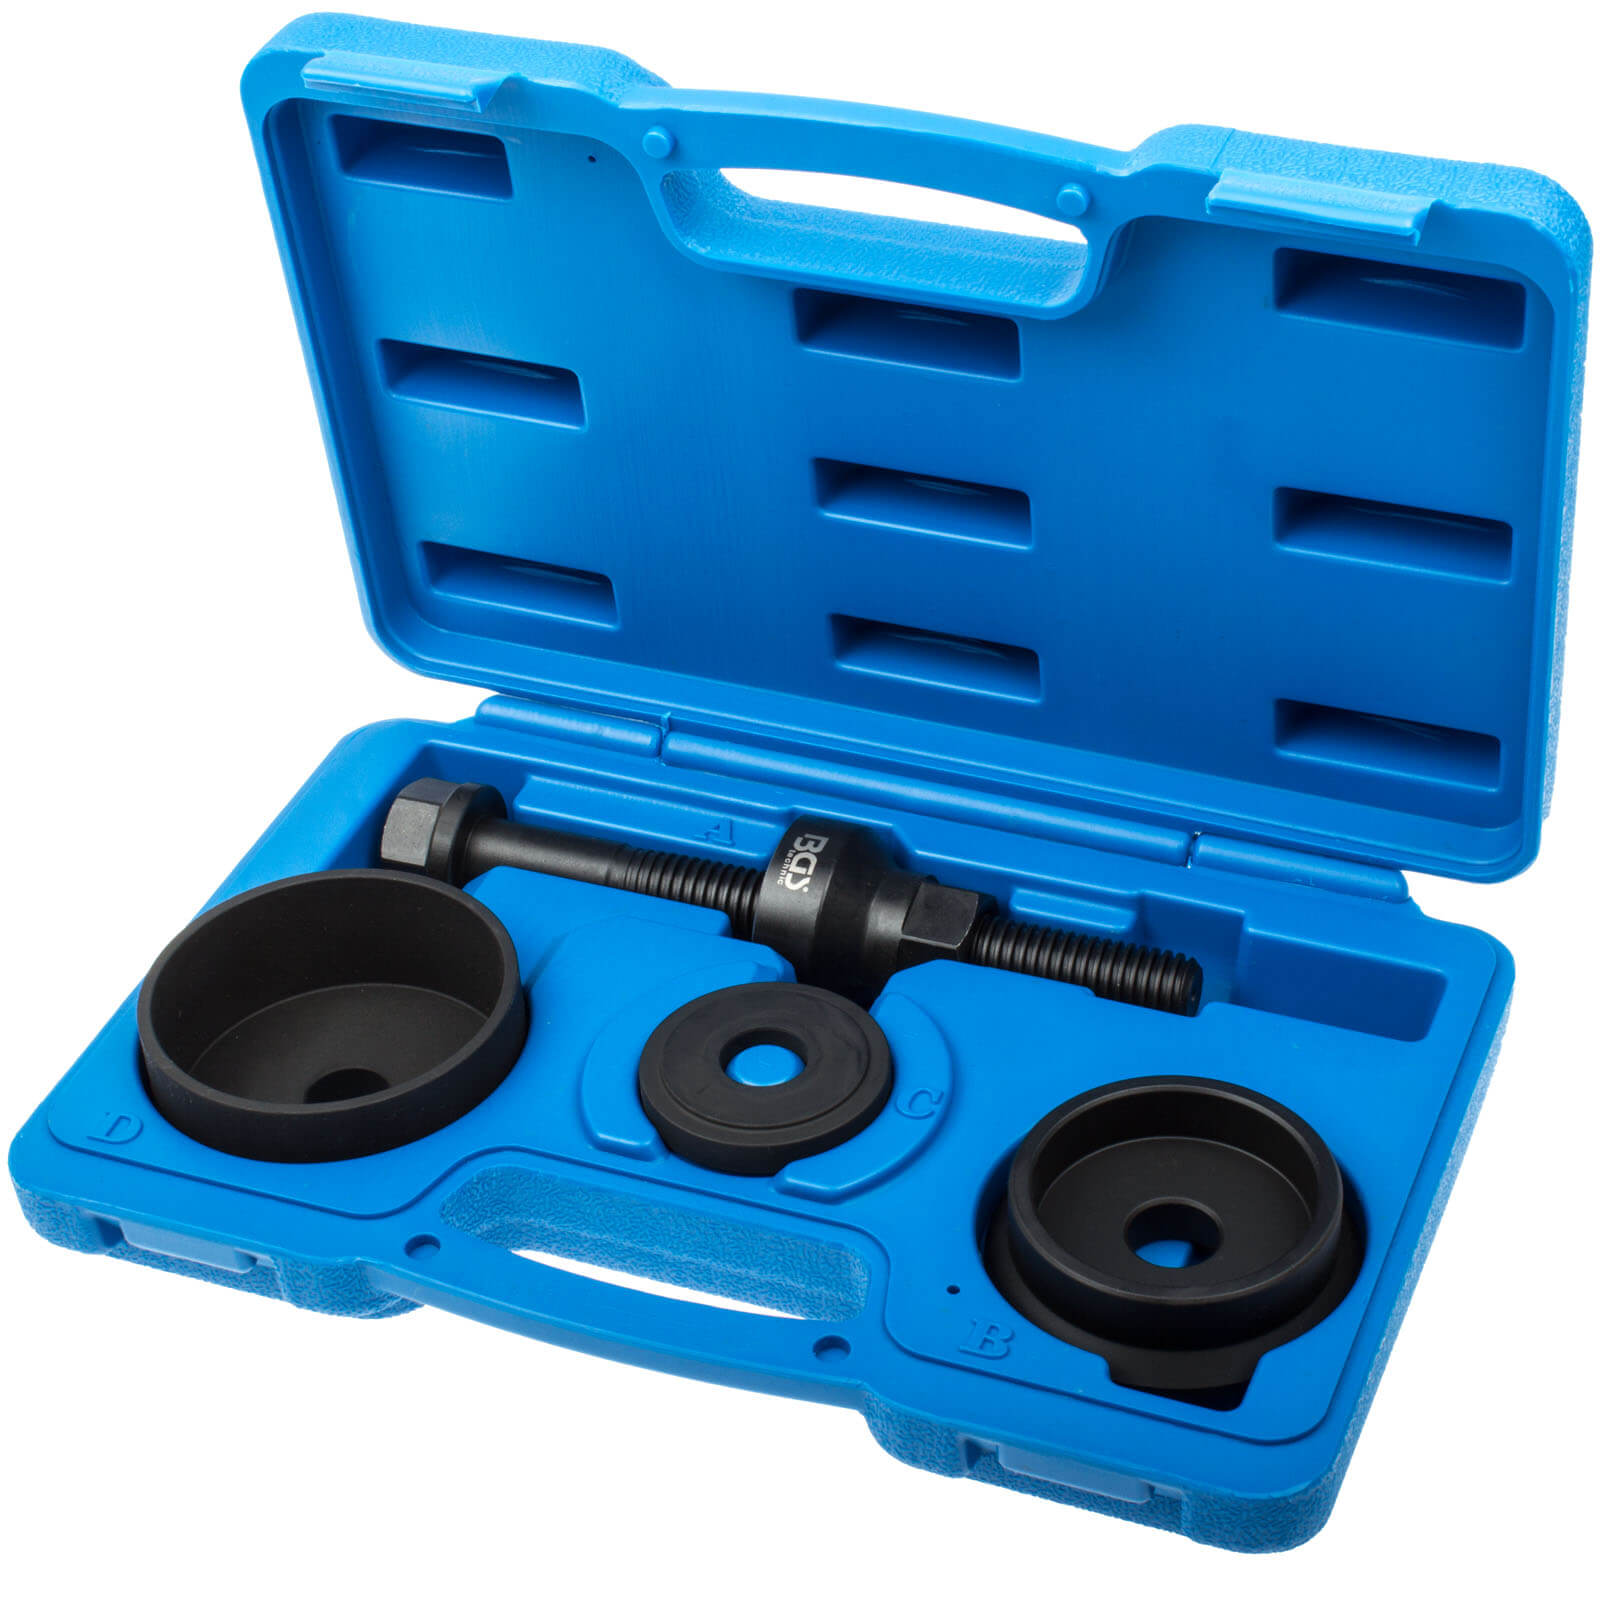 Wheel bearing tool set mercedes benz w124 w129 r129 w201 for Mercedes benz tools